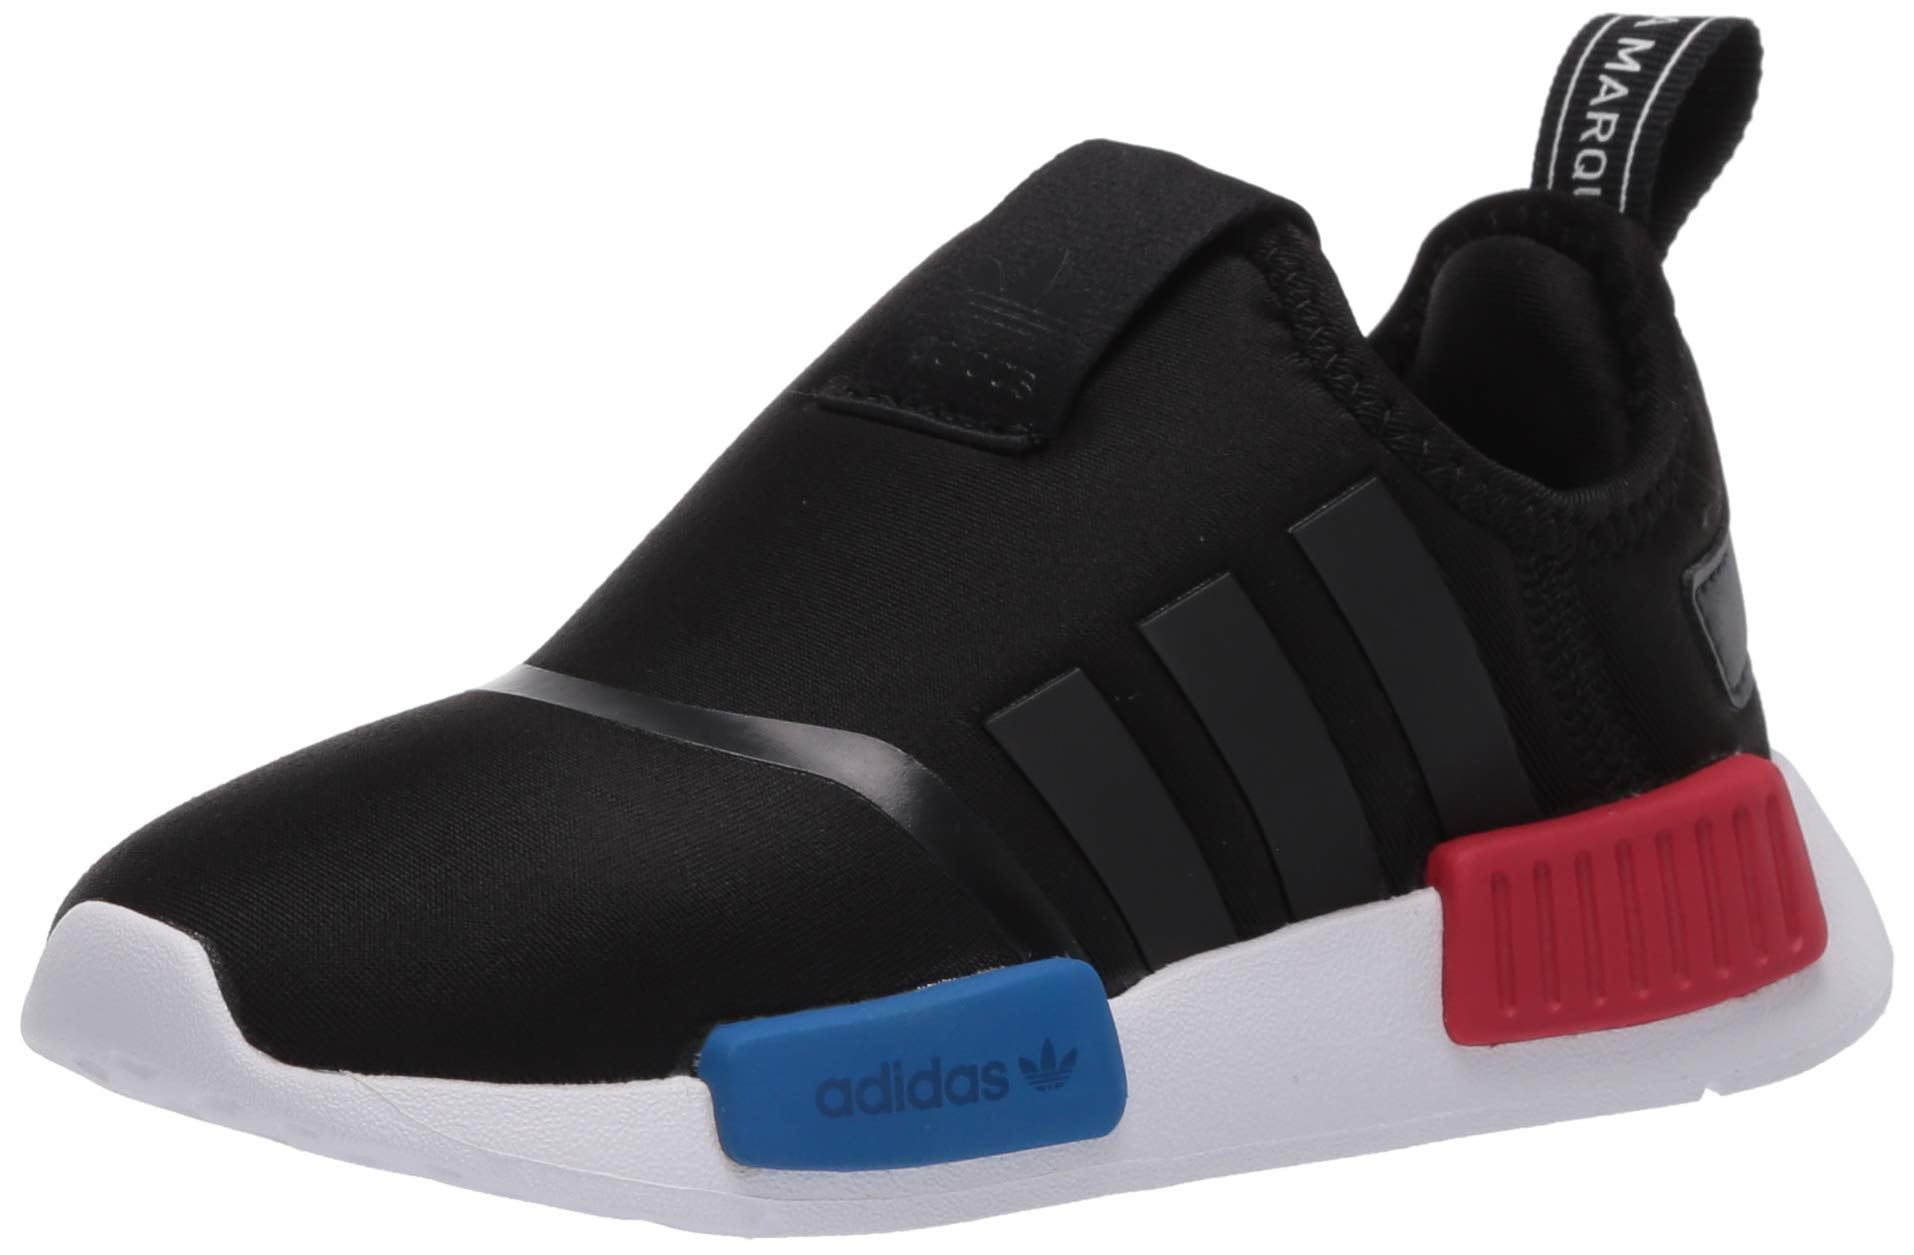 Adidas Originals Baby Unisex's NMD 360